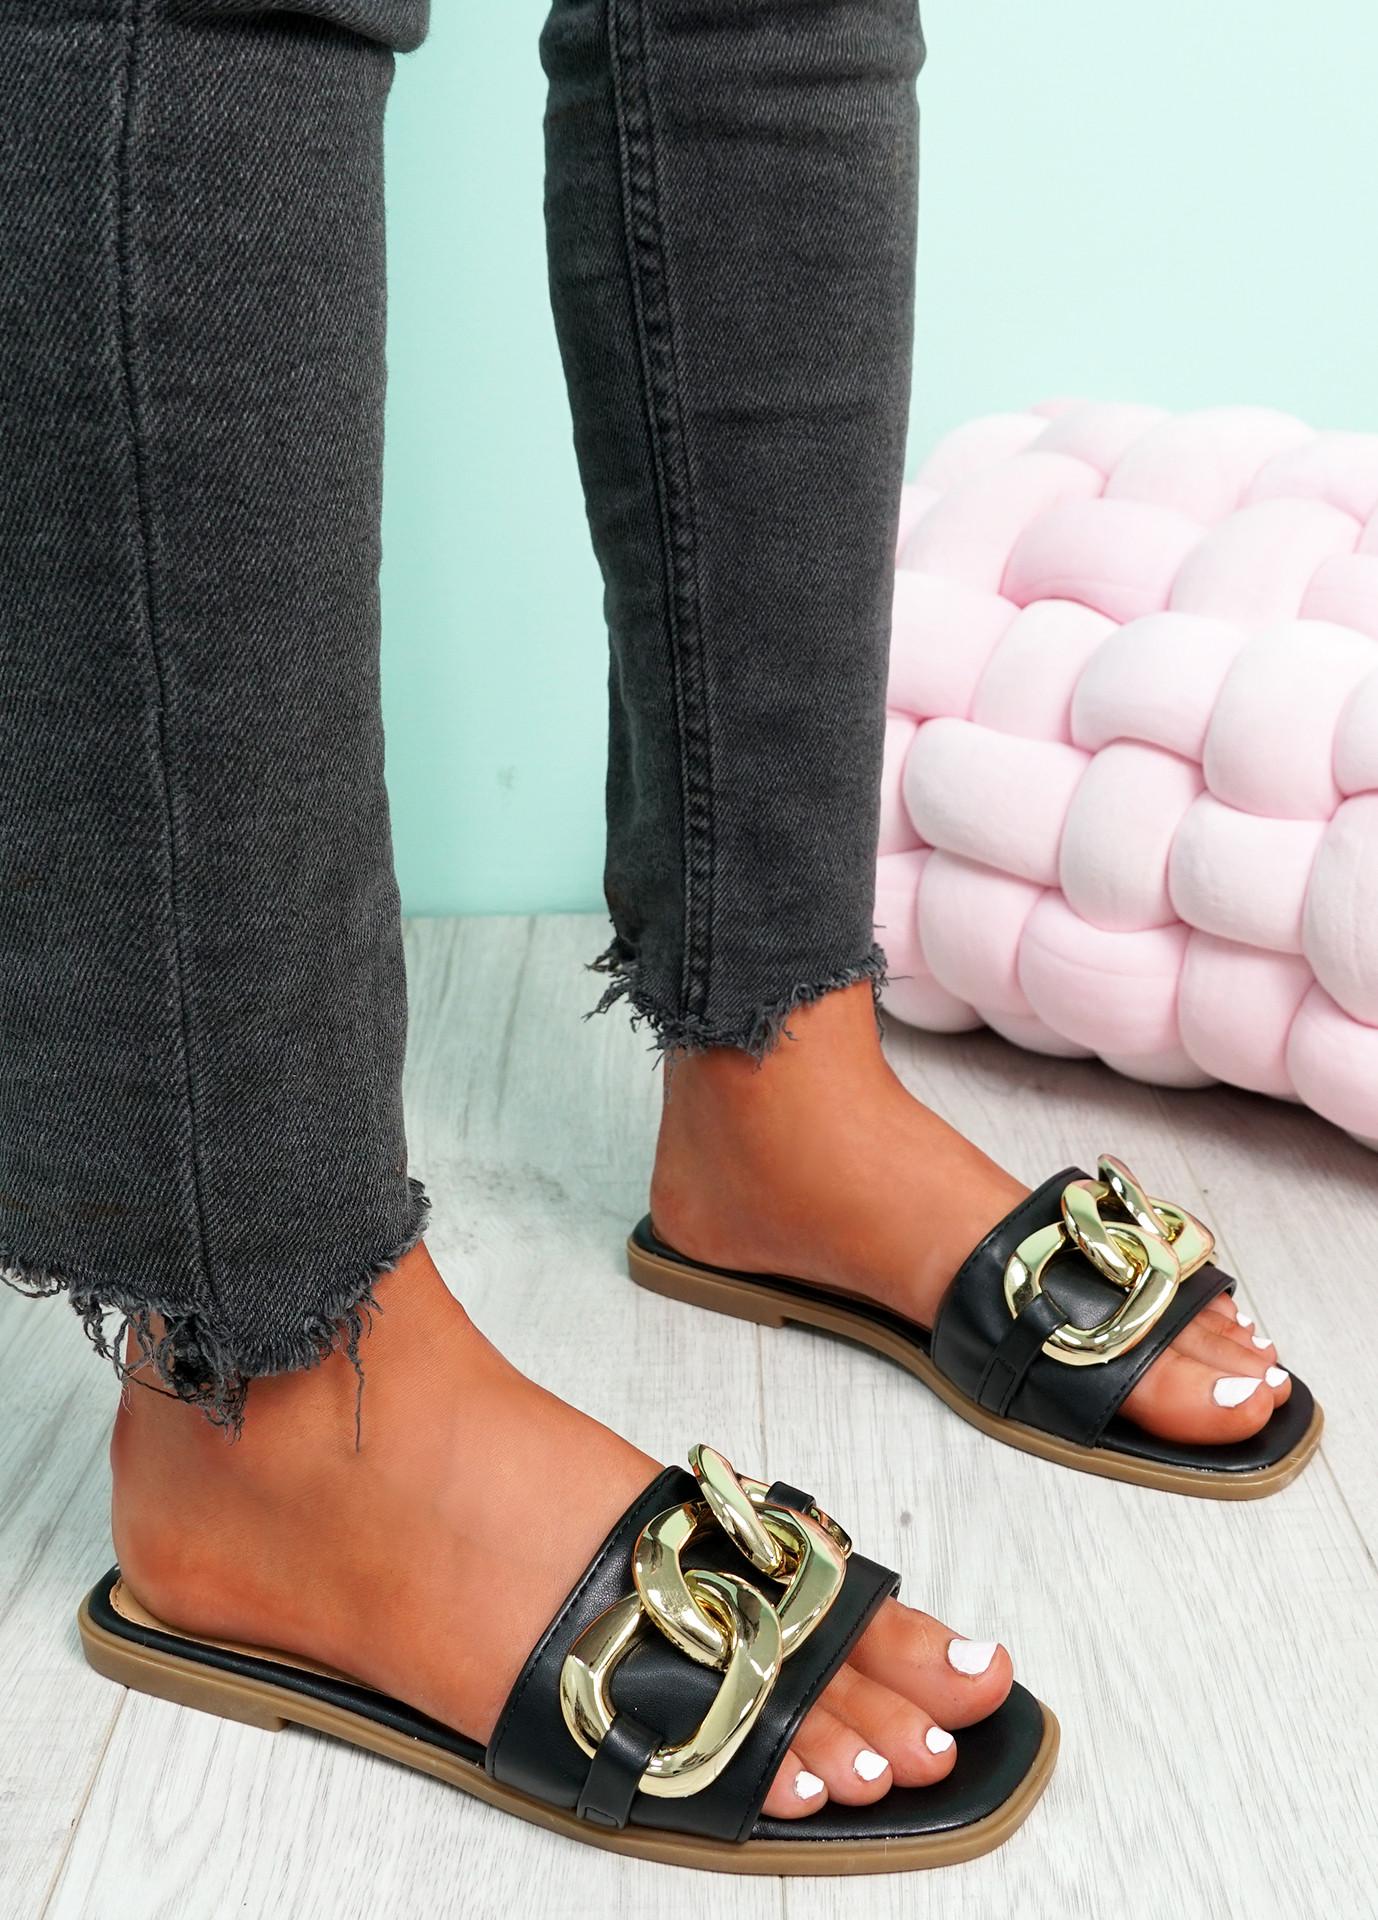 Merca Black Front Chain Flat Sandals